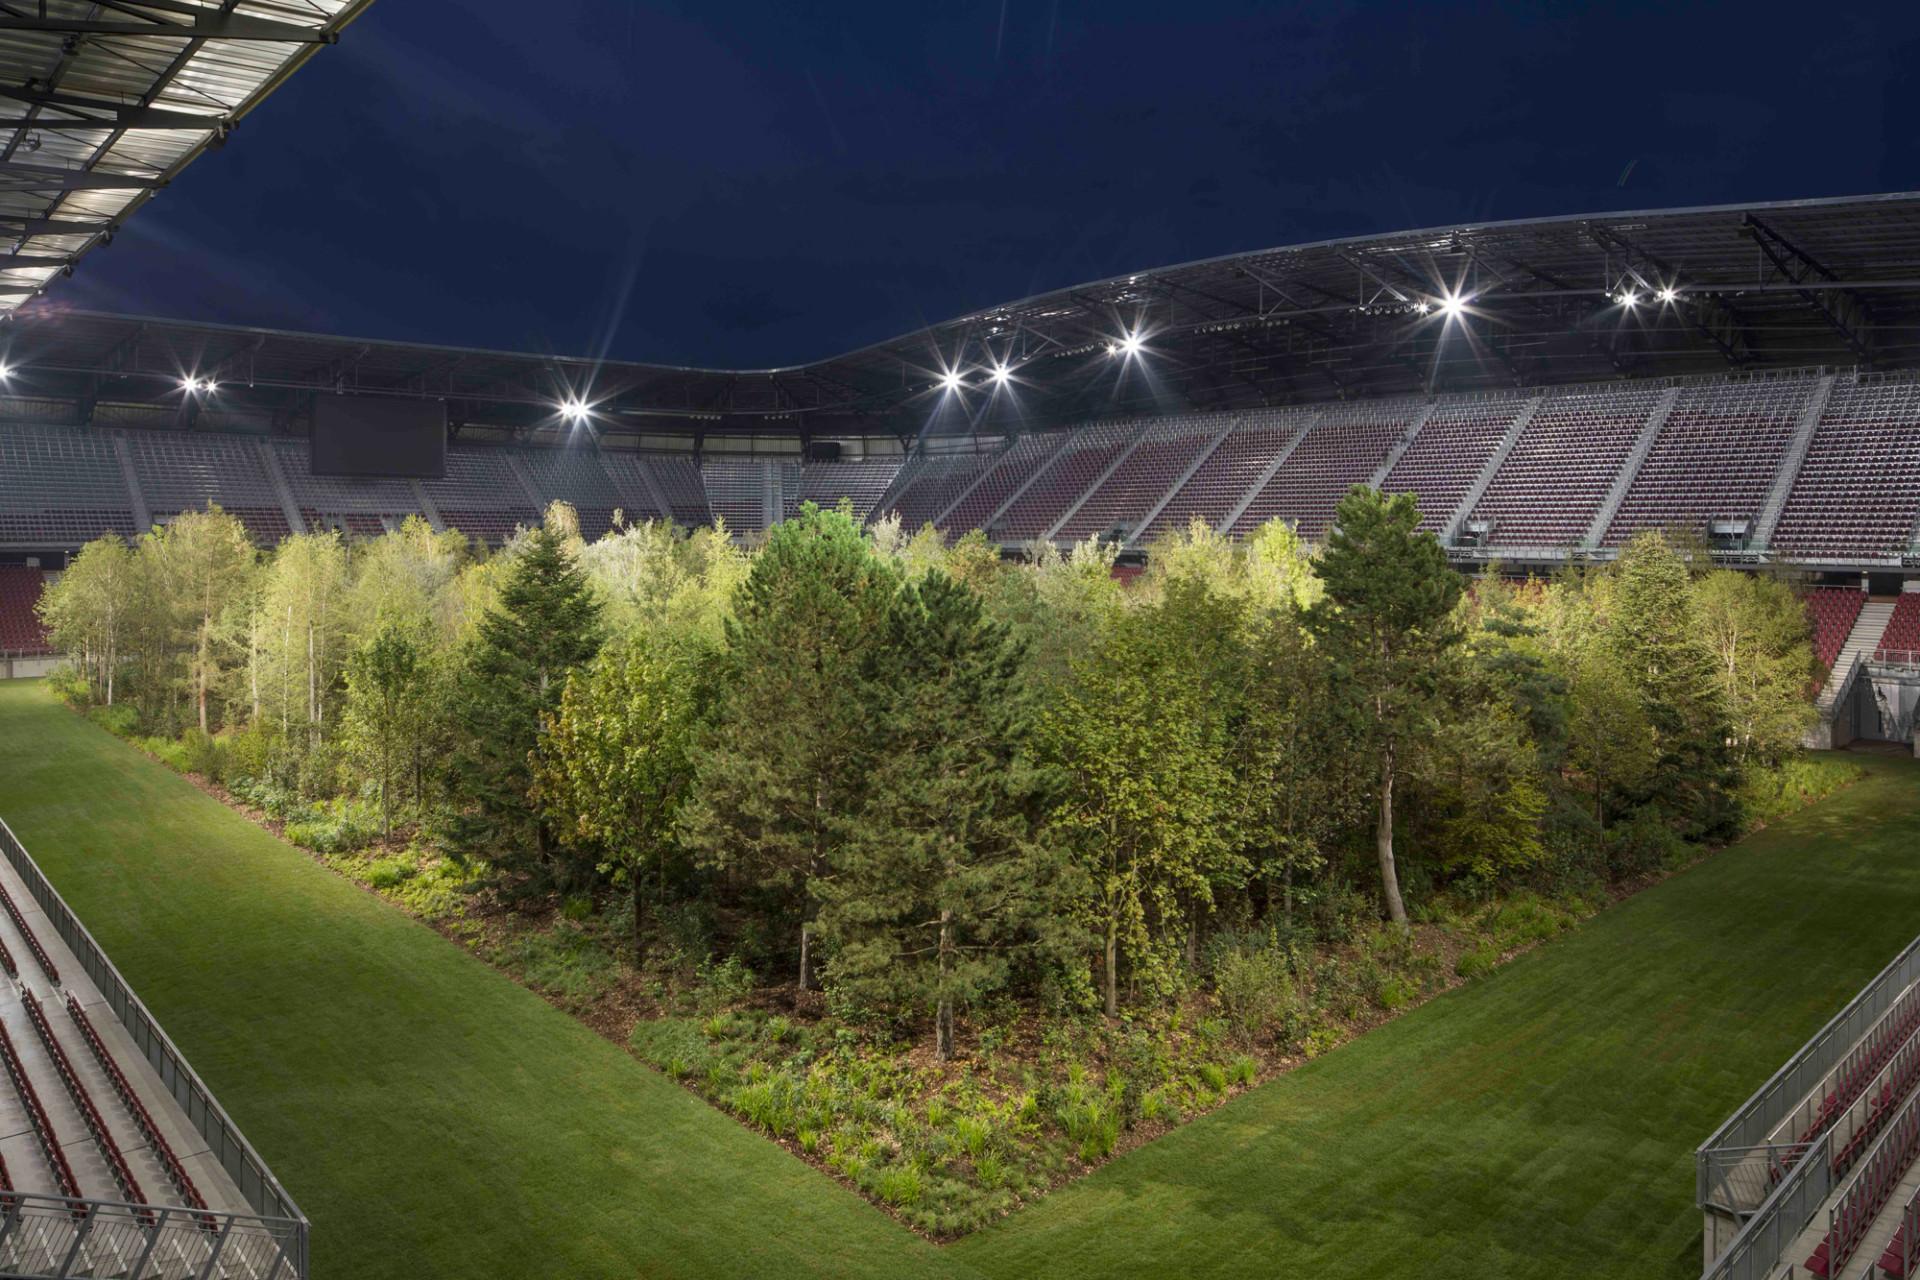 """FOR FOREST - The Unending Attraction of Nature"" (2019), Stadio Wörthersee, Klagenfurt, Austria. Tutte le fotografie di Gerhard Maurer, se non diversamente indicato"